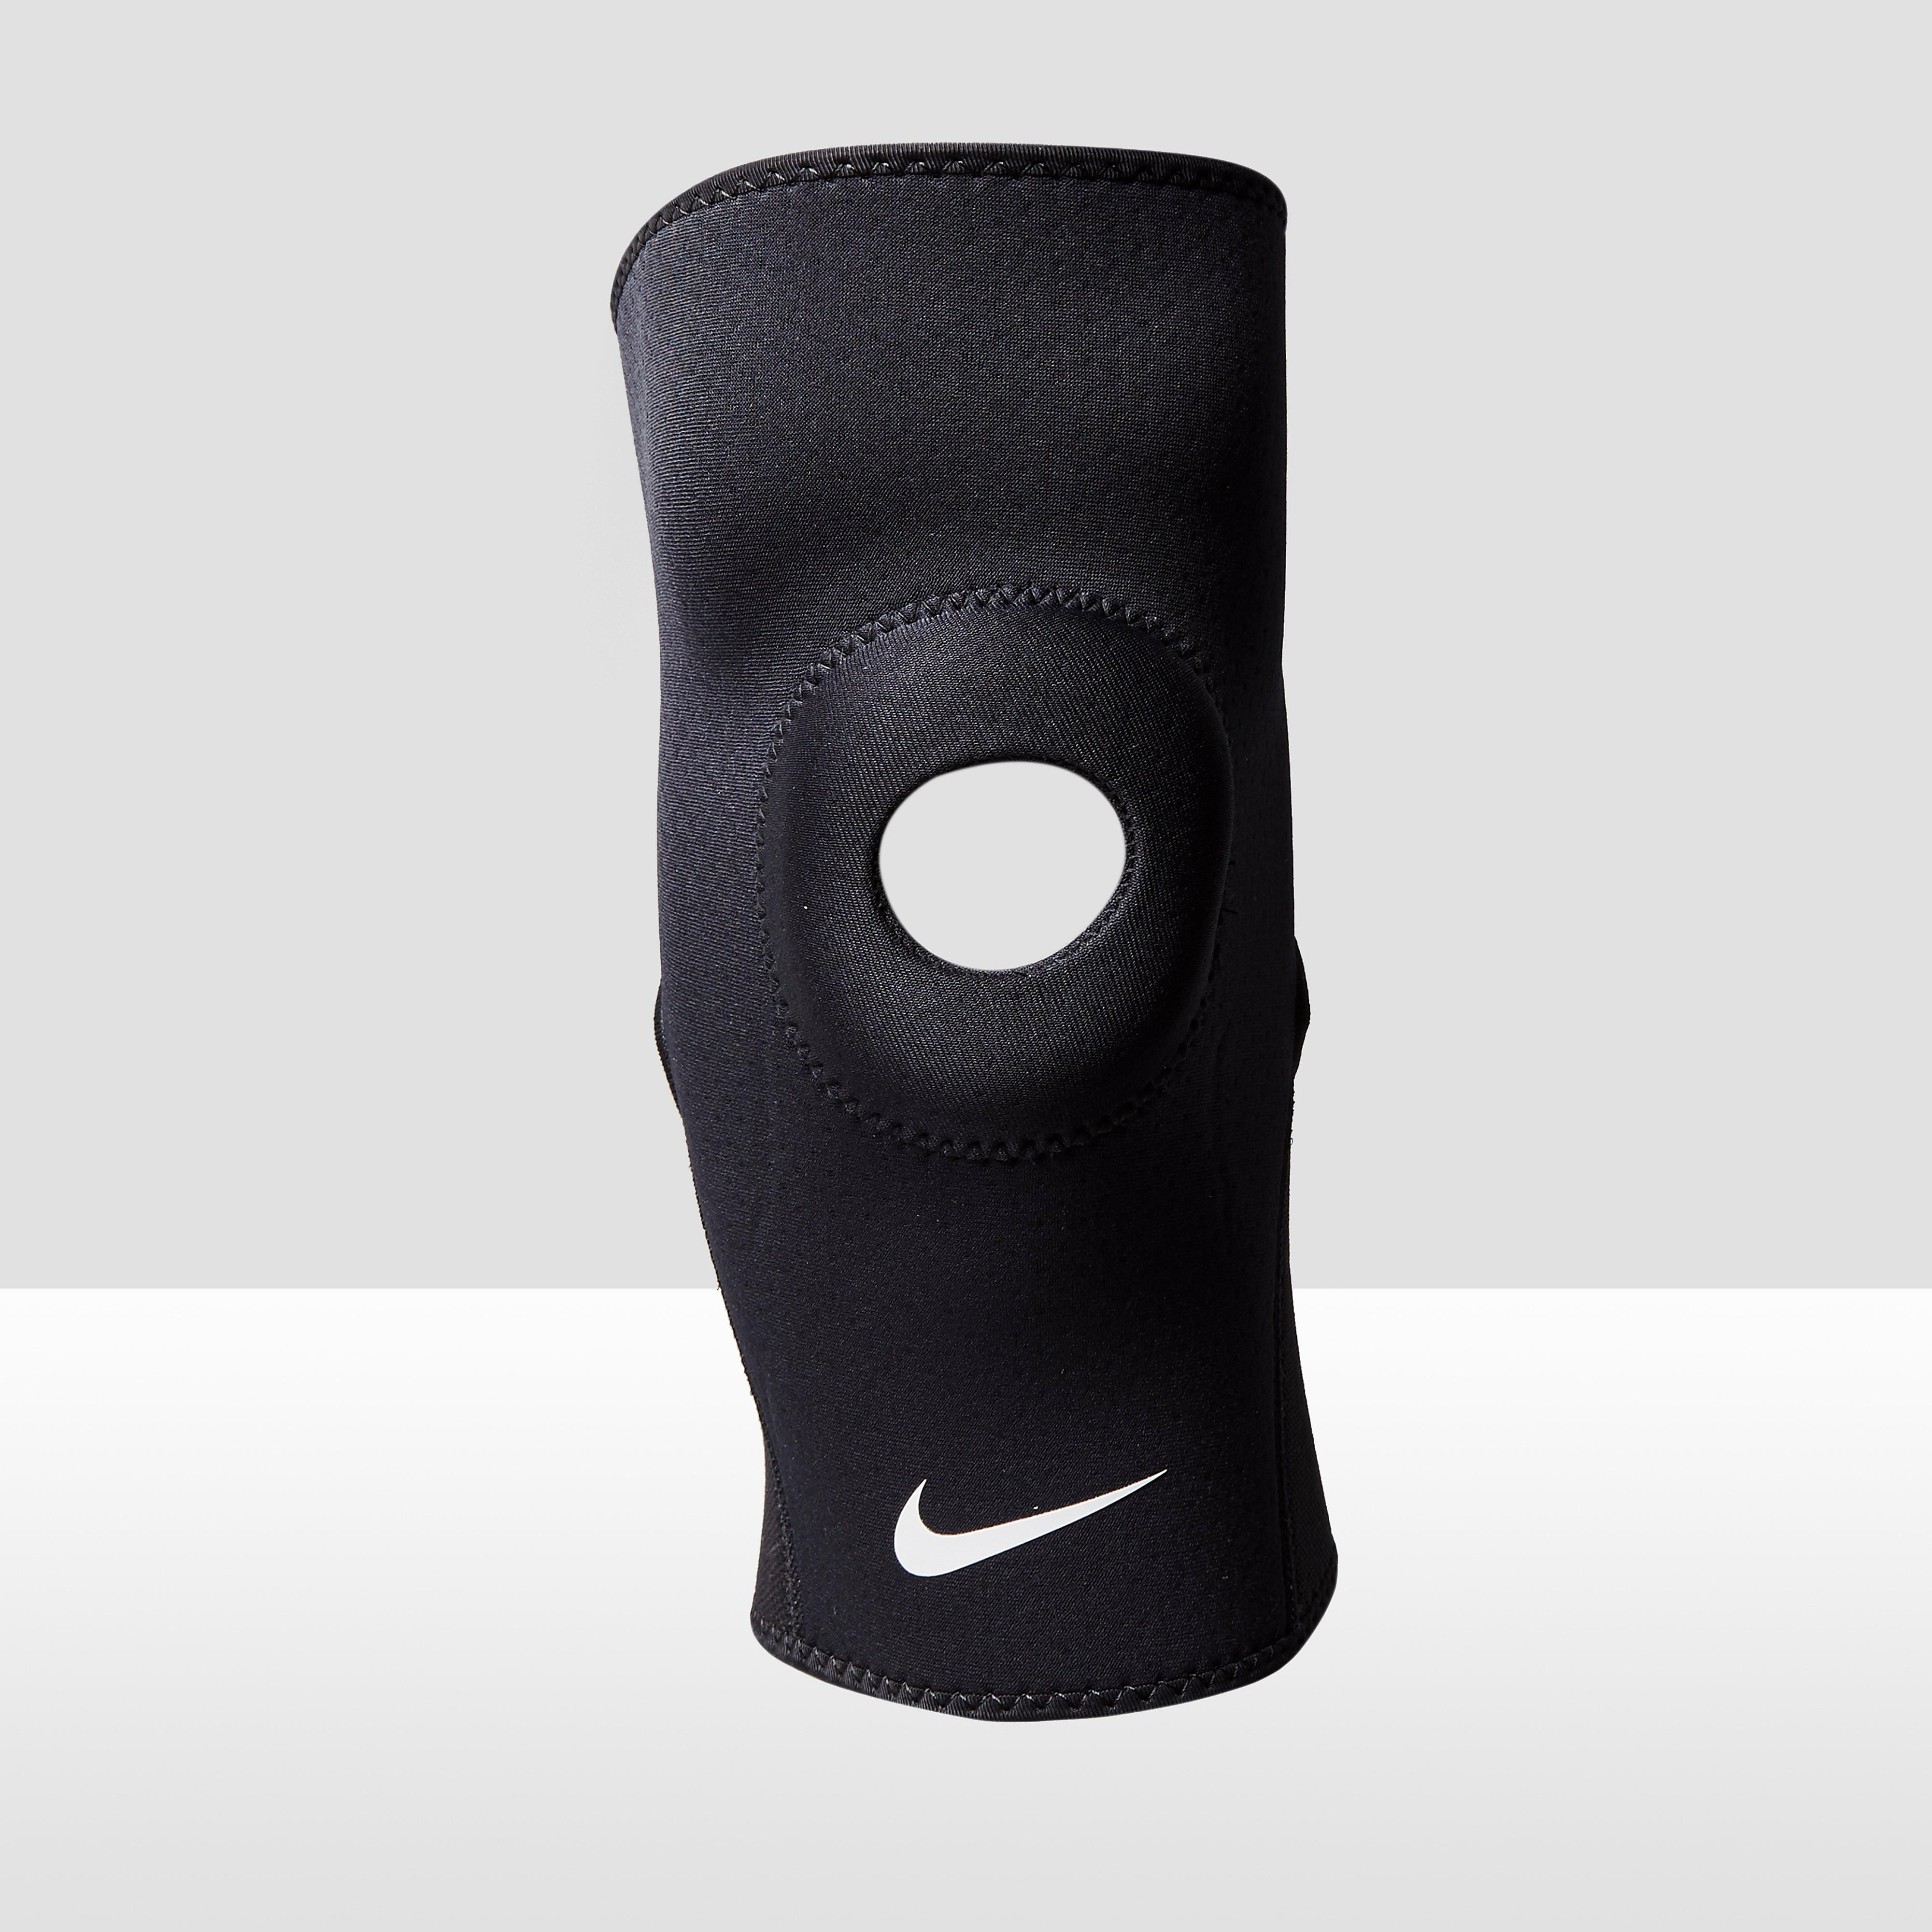 Nike PRO COMBAT OPEN KNEE Sleeve